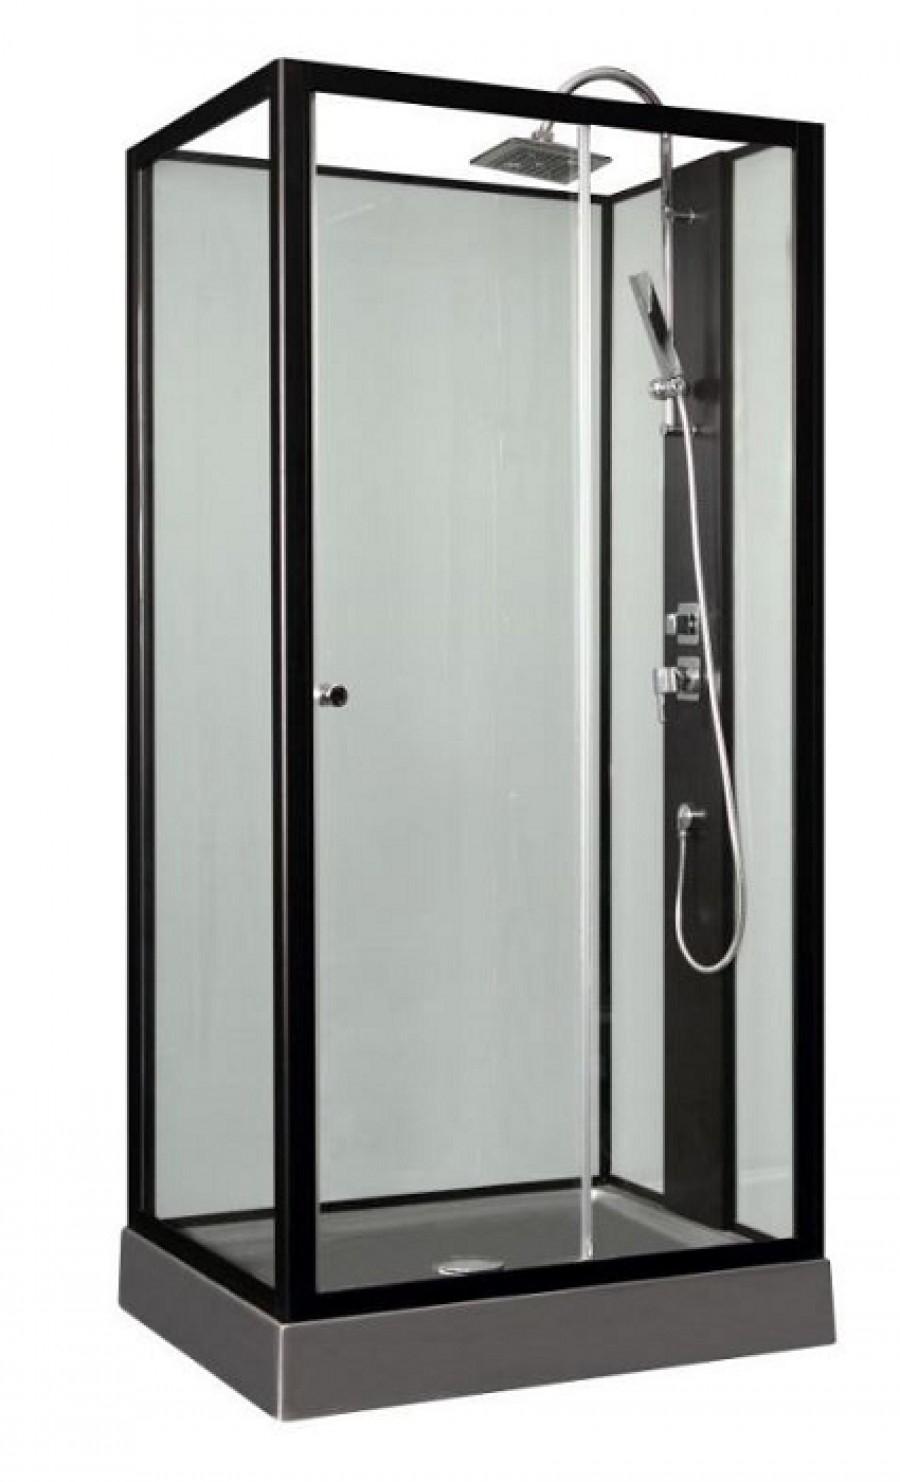 cabine de douche astoria gris 100x80. Black Bedroom Furniture Sets. Home Design Ideas